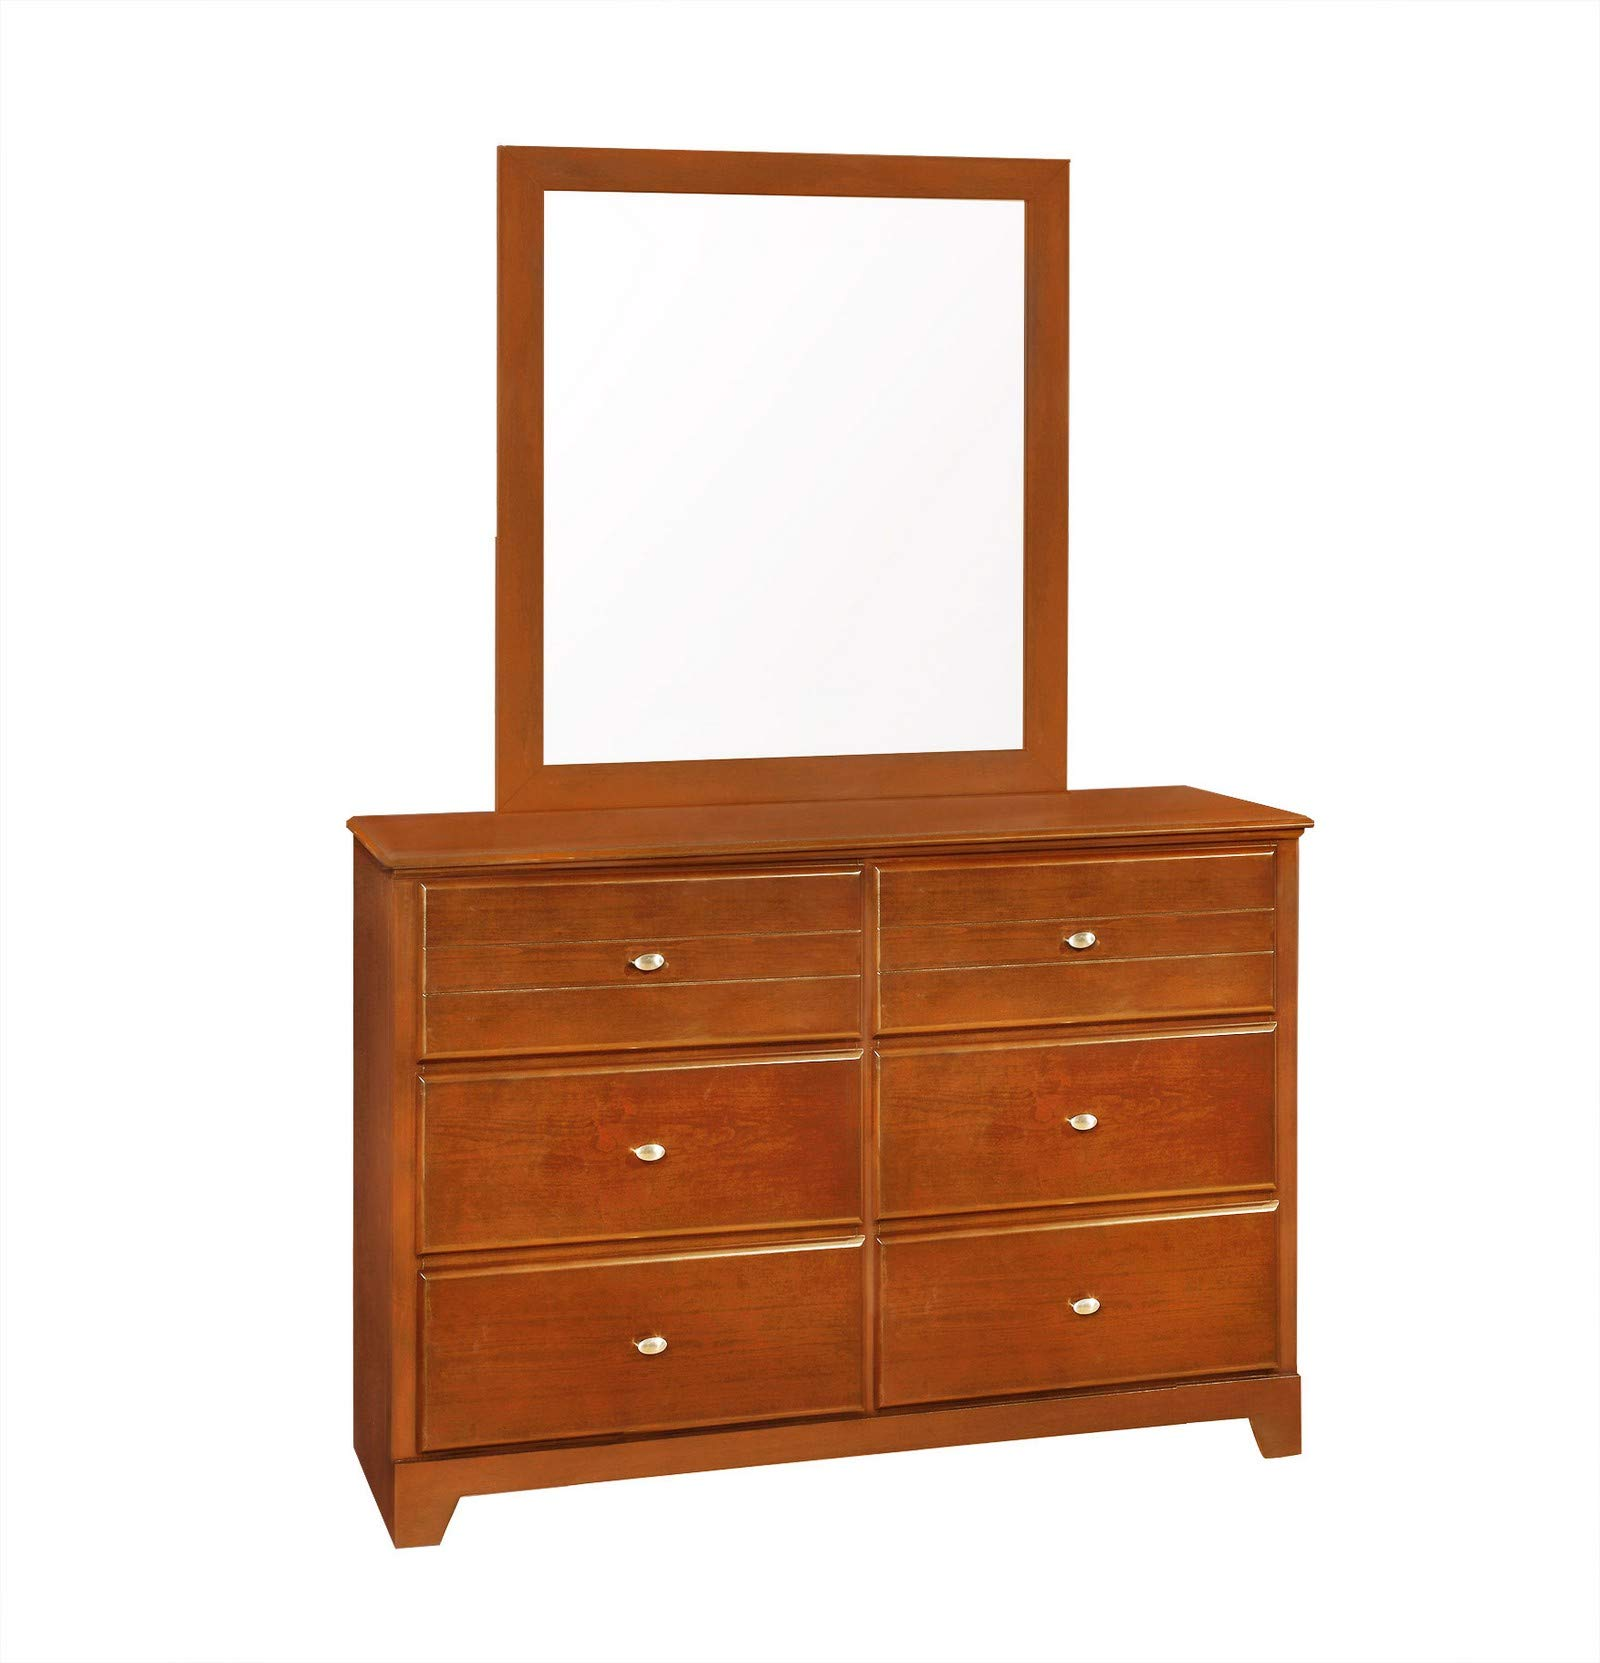 Coaster 400814 Home Furnishings Mirror, Oak